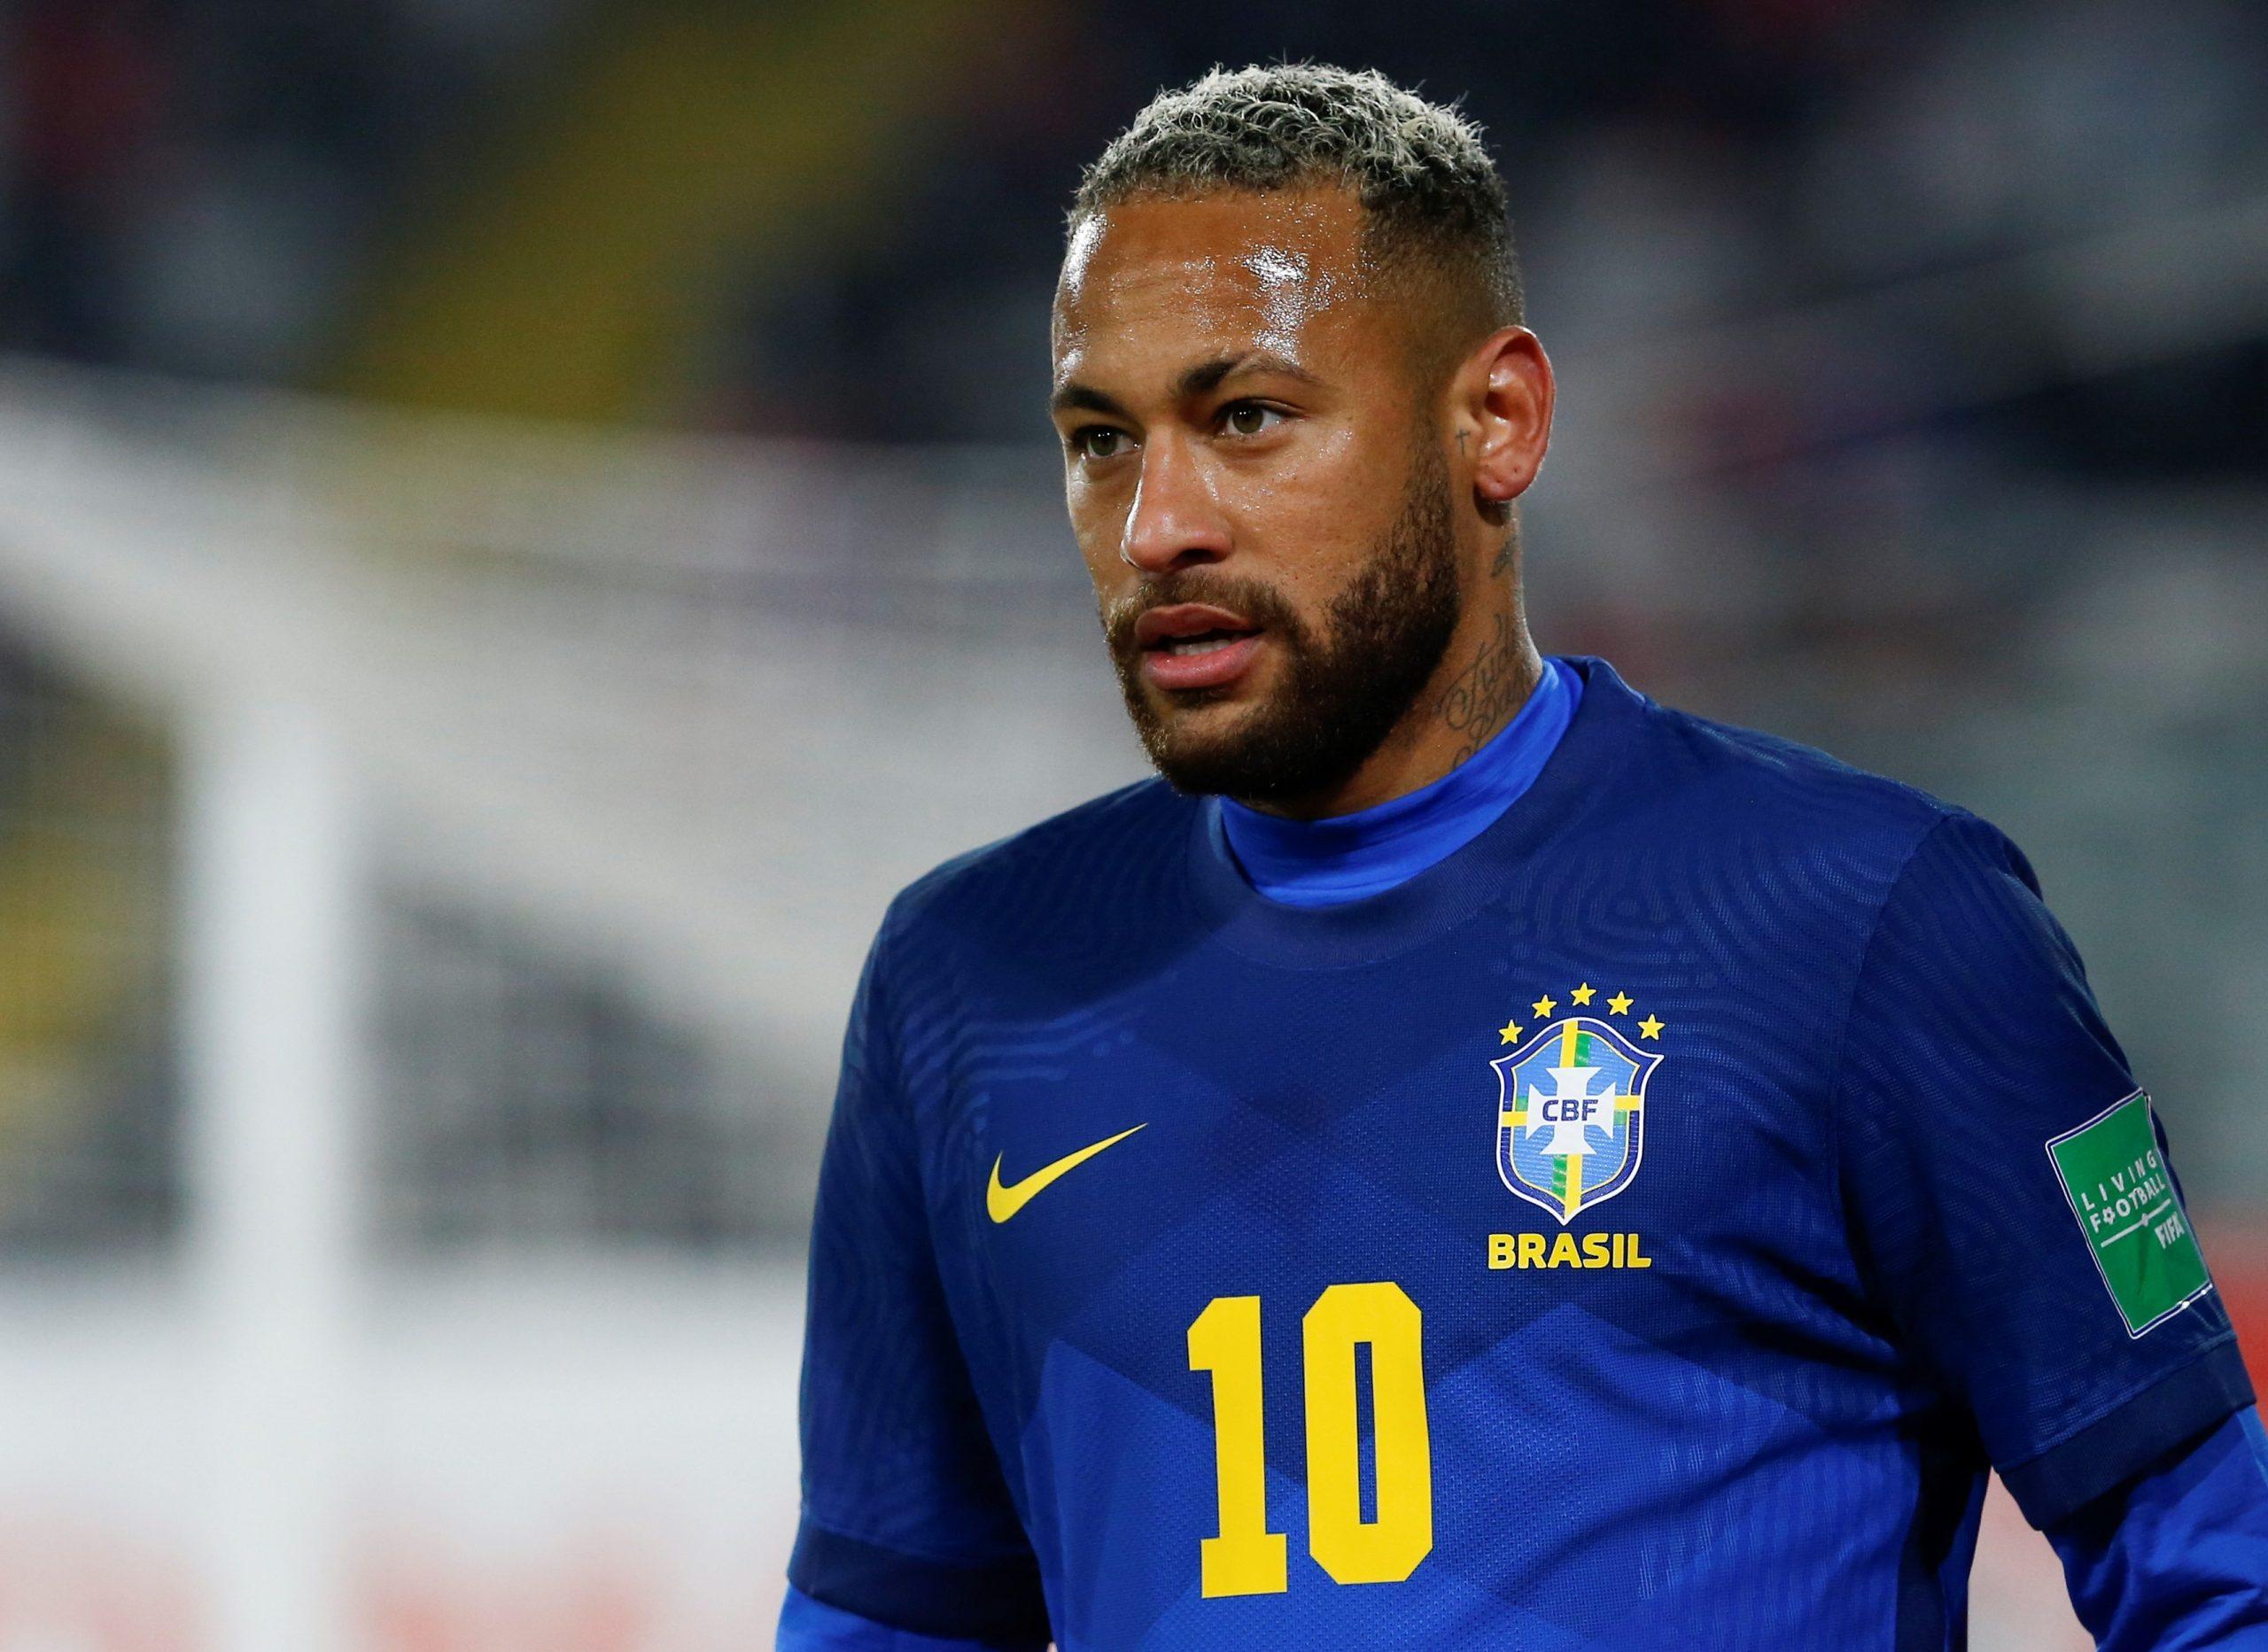 Sin Neymar, Brasil busca ante Venezuela extender camino invicto a Qatar 2022 - prensa Libre